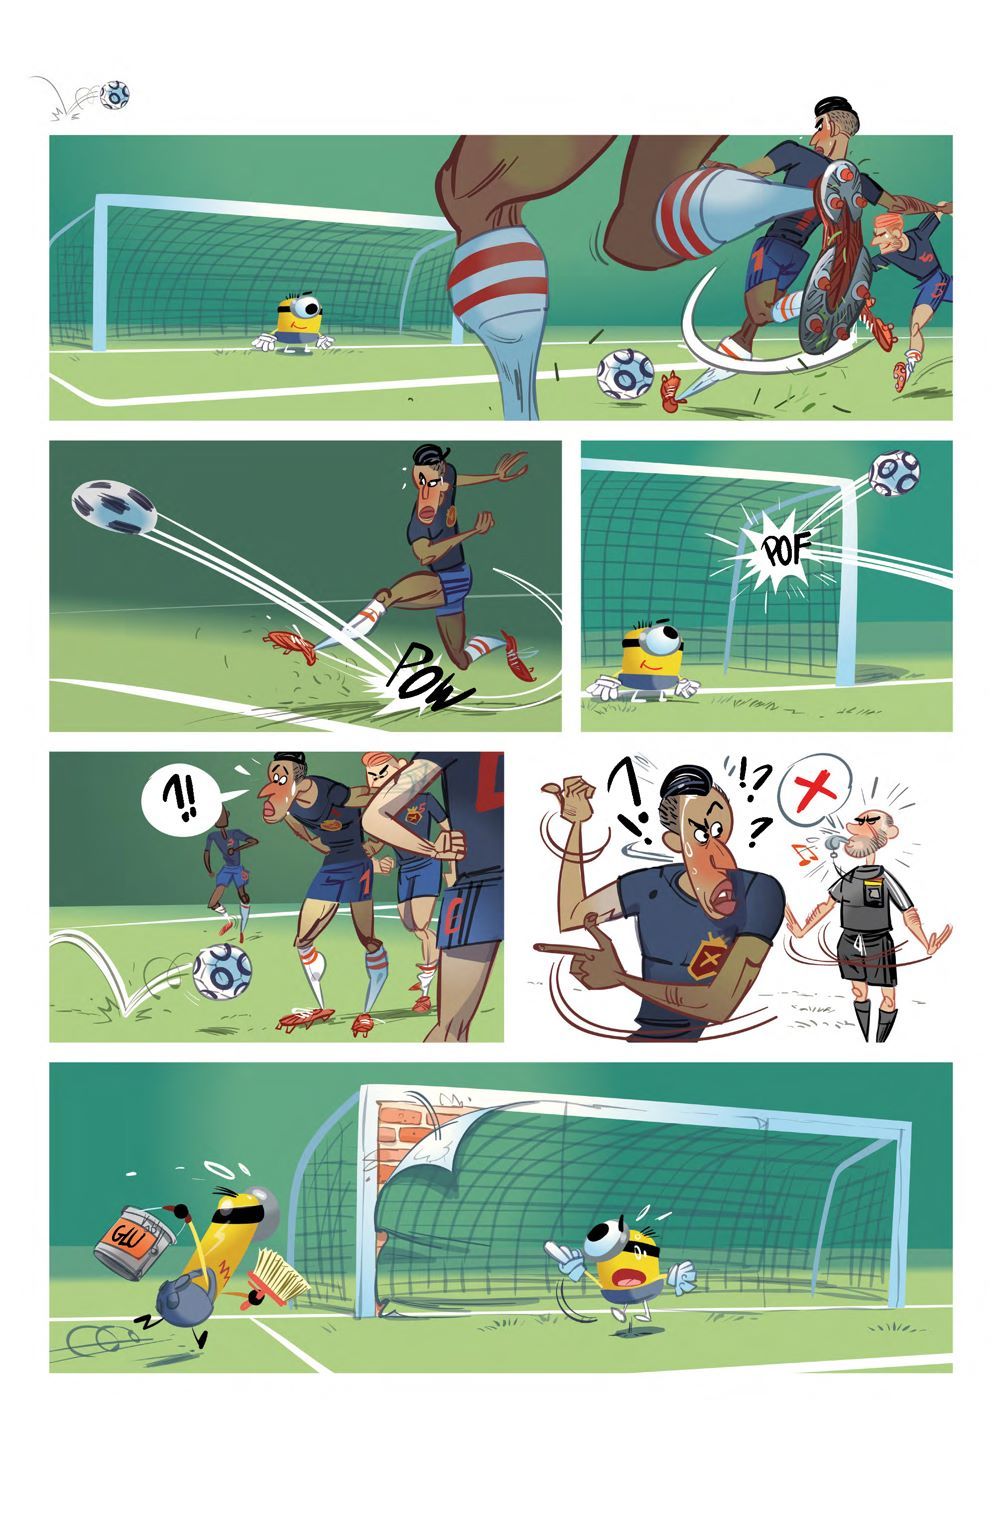 Interiors-Minions-Sports-1-Full-PDF-2_Page_1 ComicList Previews: MINIONS VOLUME 5 SPORTS #1